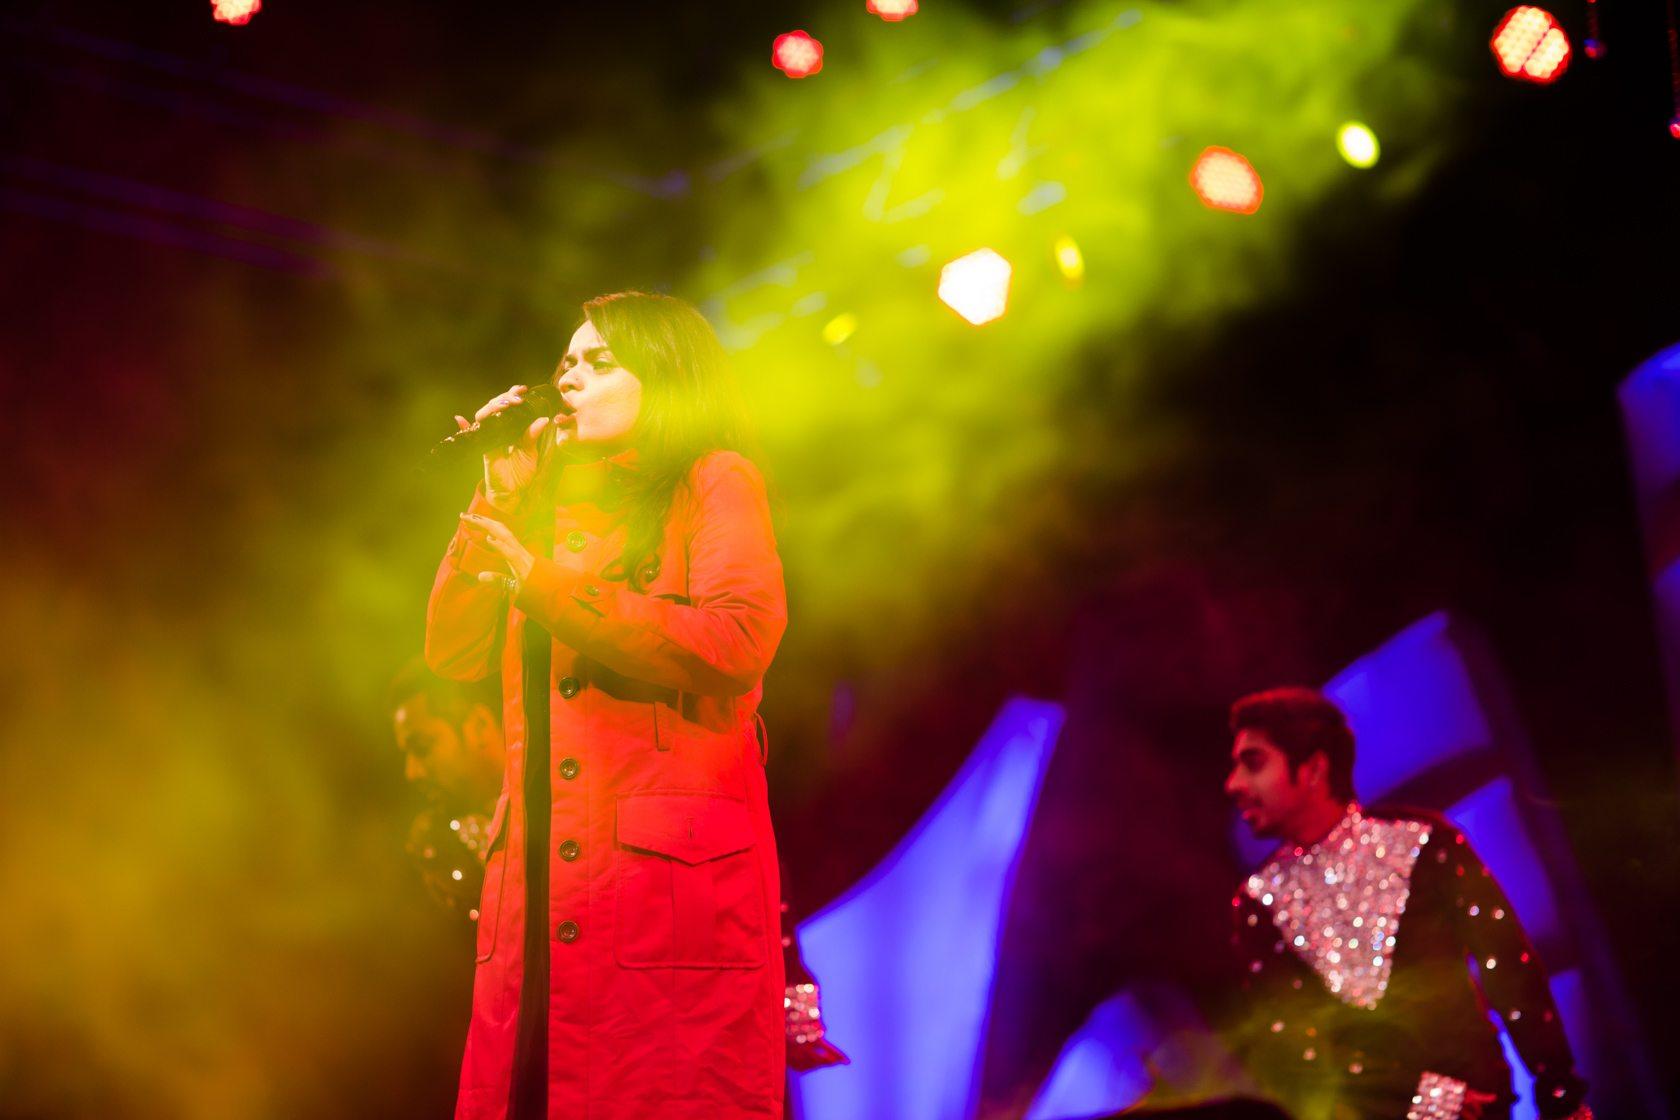 India_Wedding_233.jpg